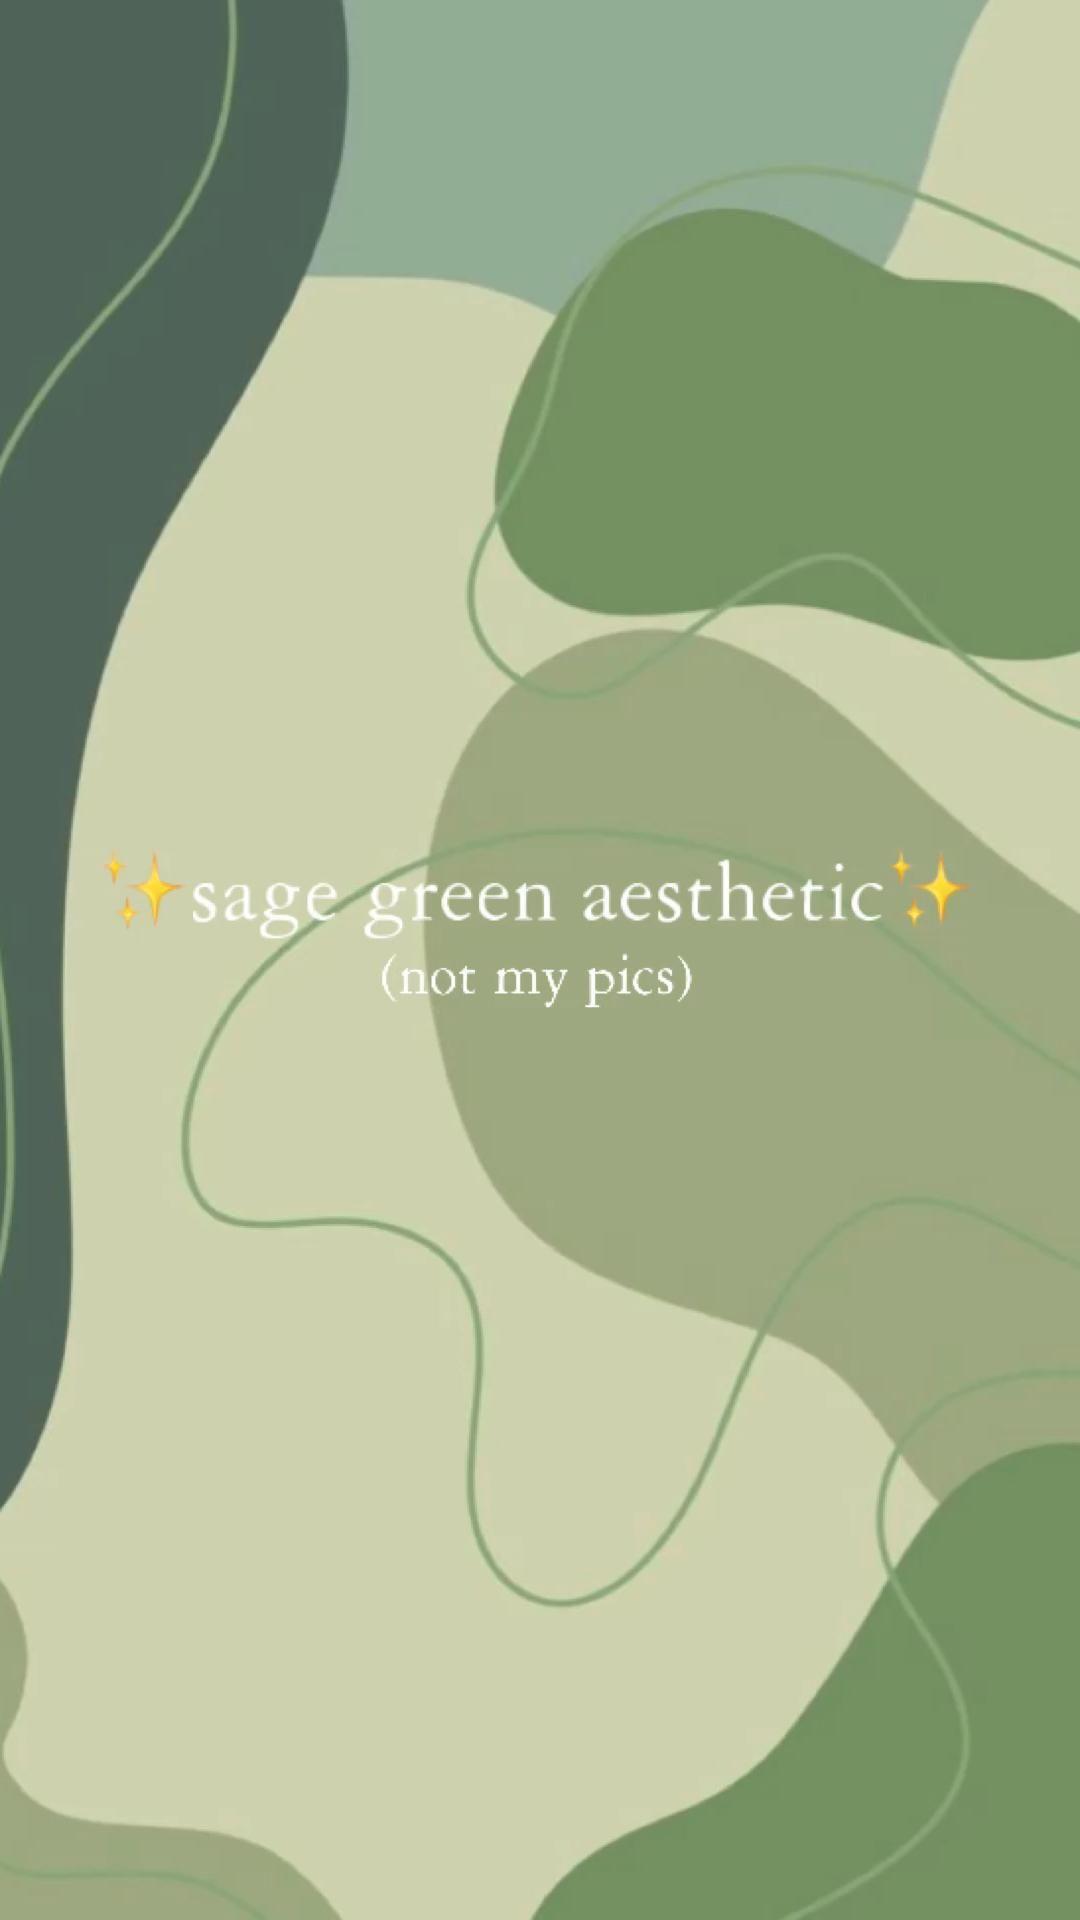 ✨🌱Sage green aesthetic🌱✨